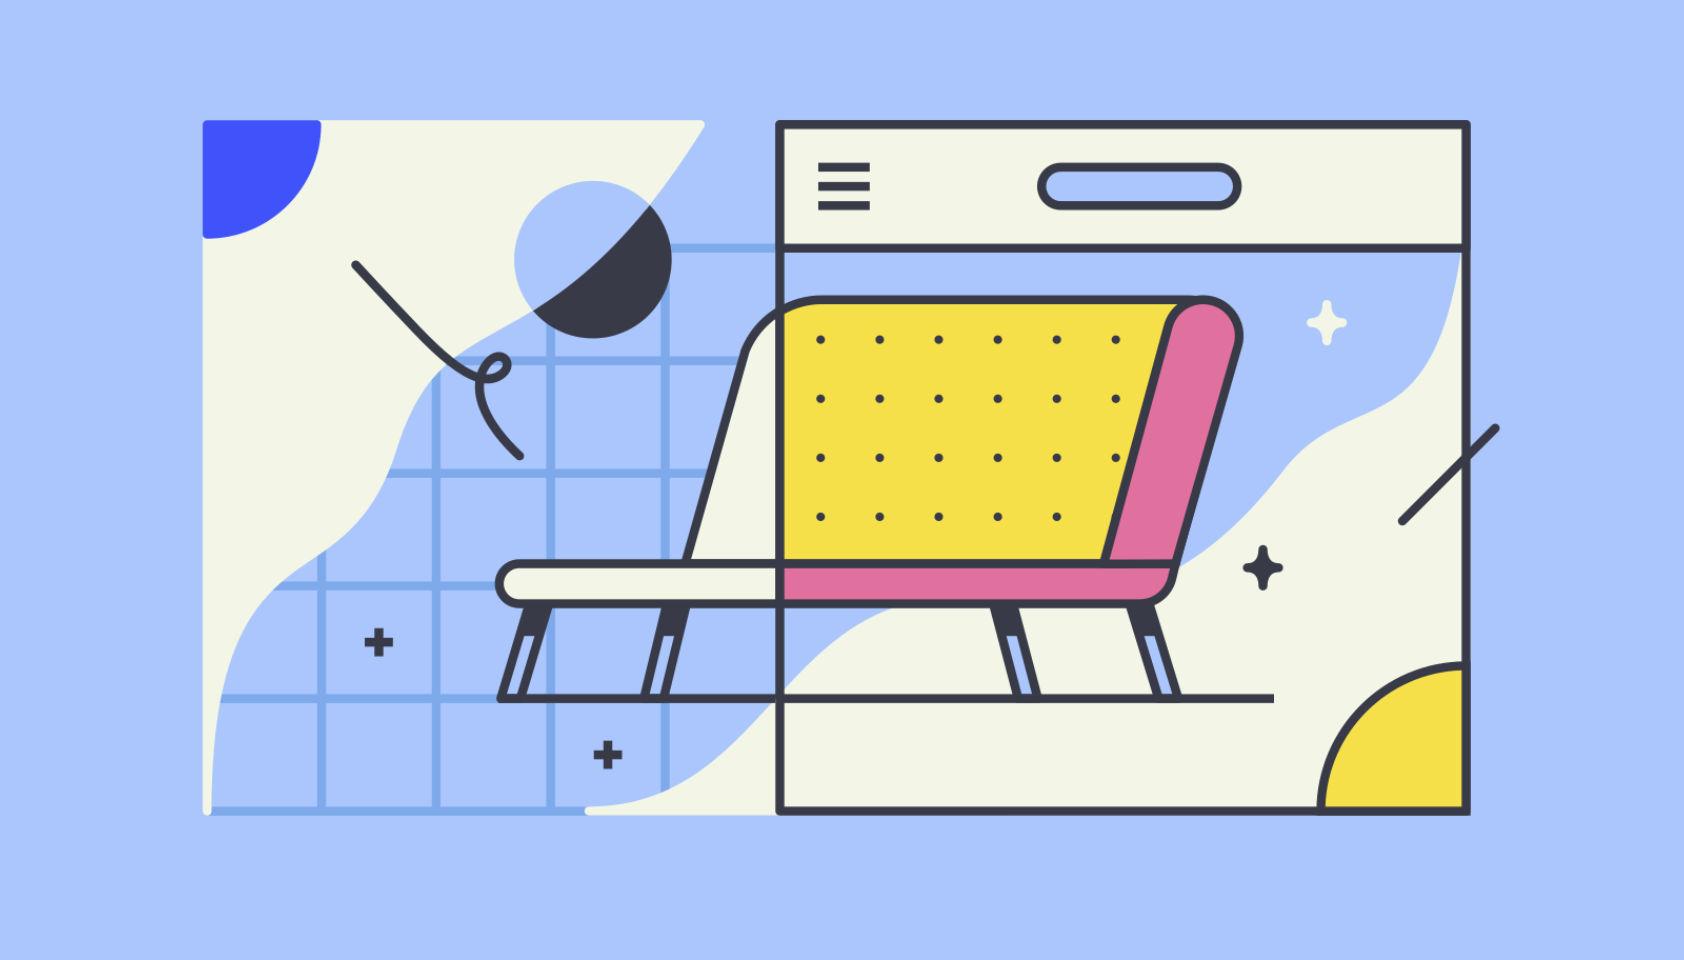 Popular design news of the week: July 1, 2019 - July 7, 2019